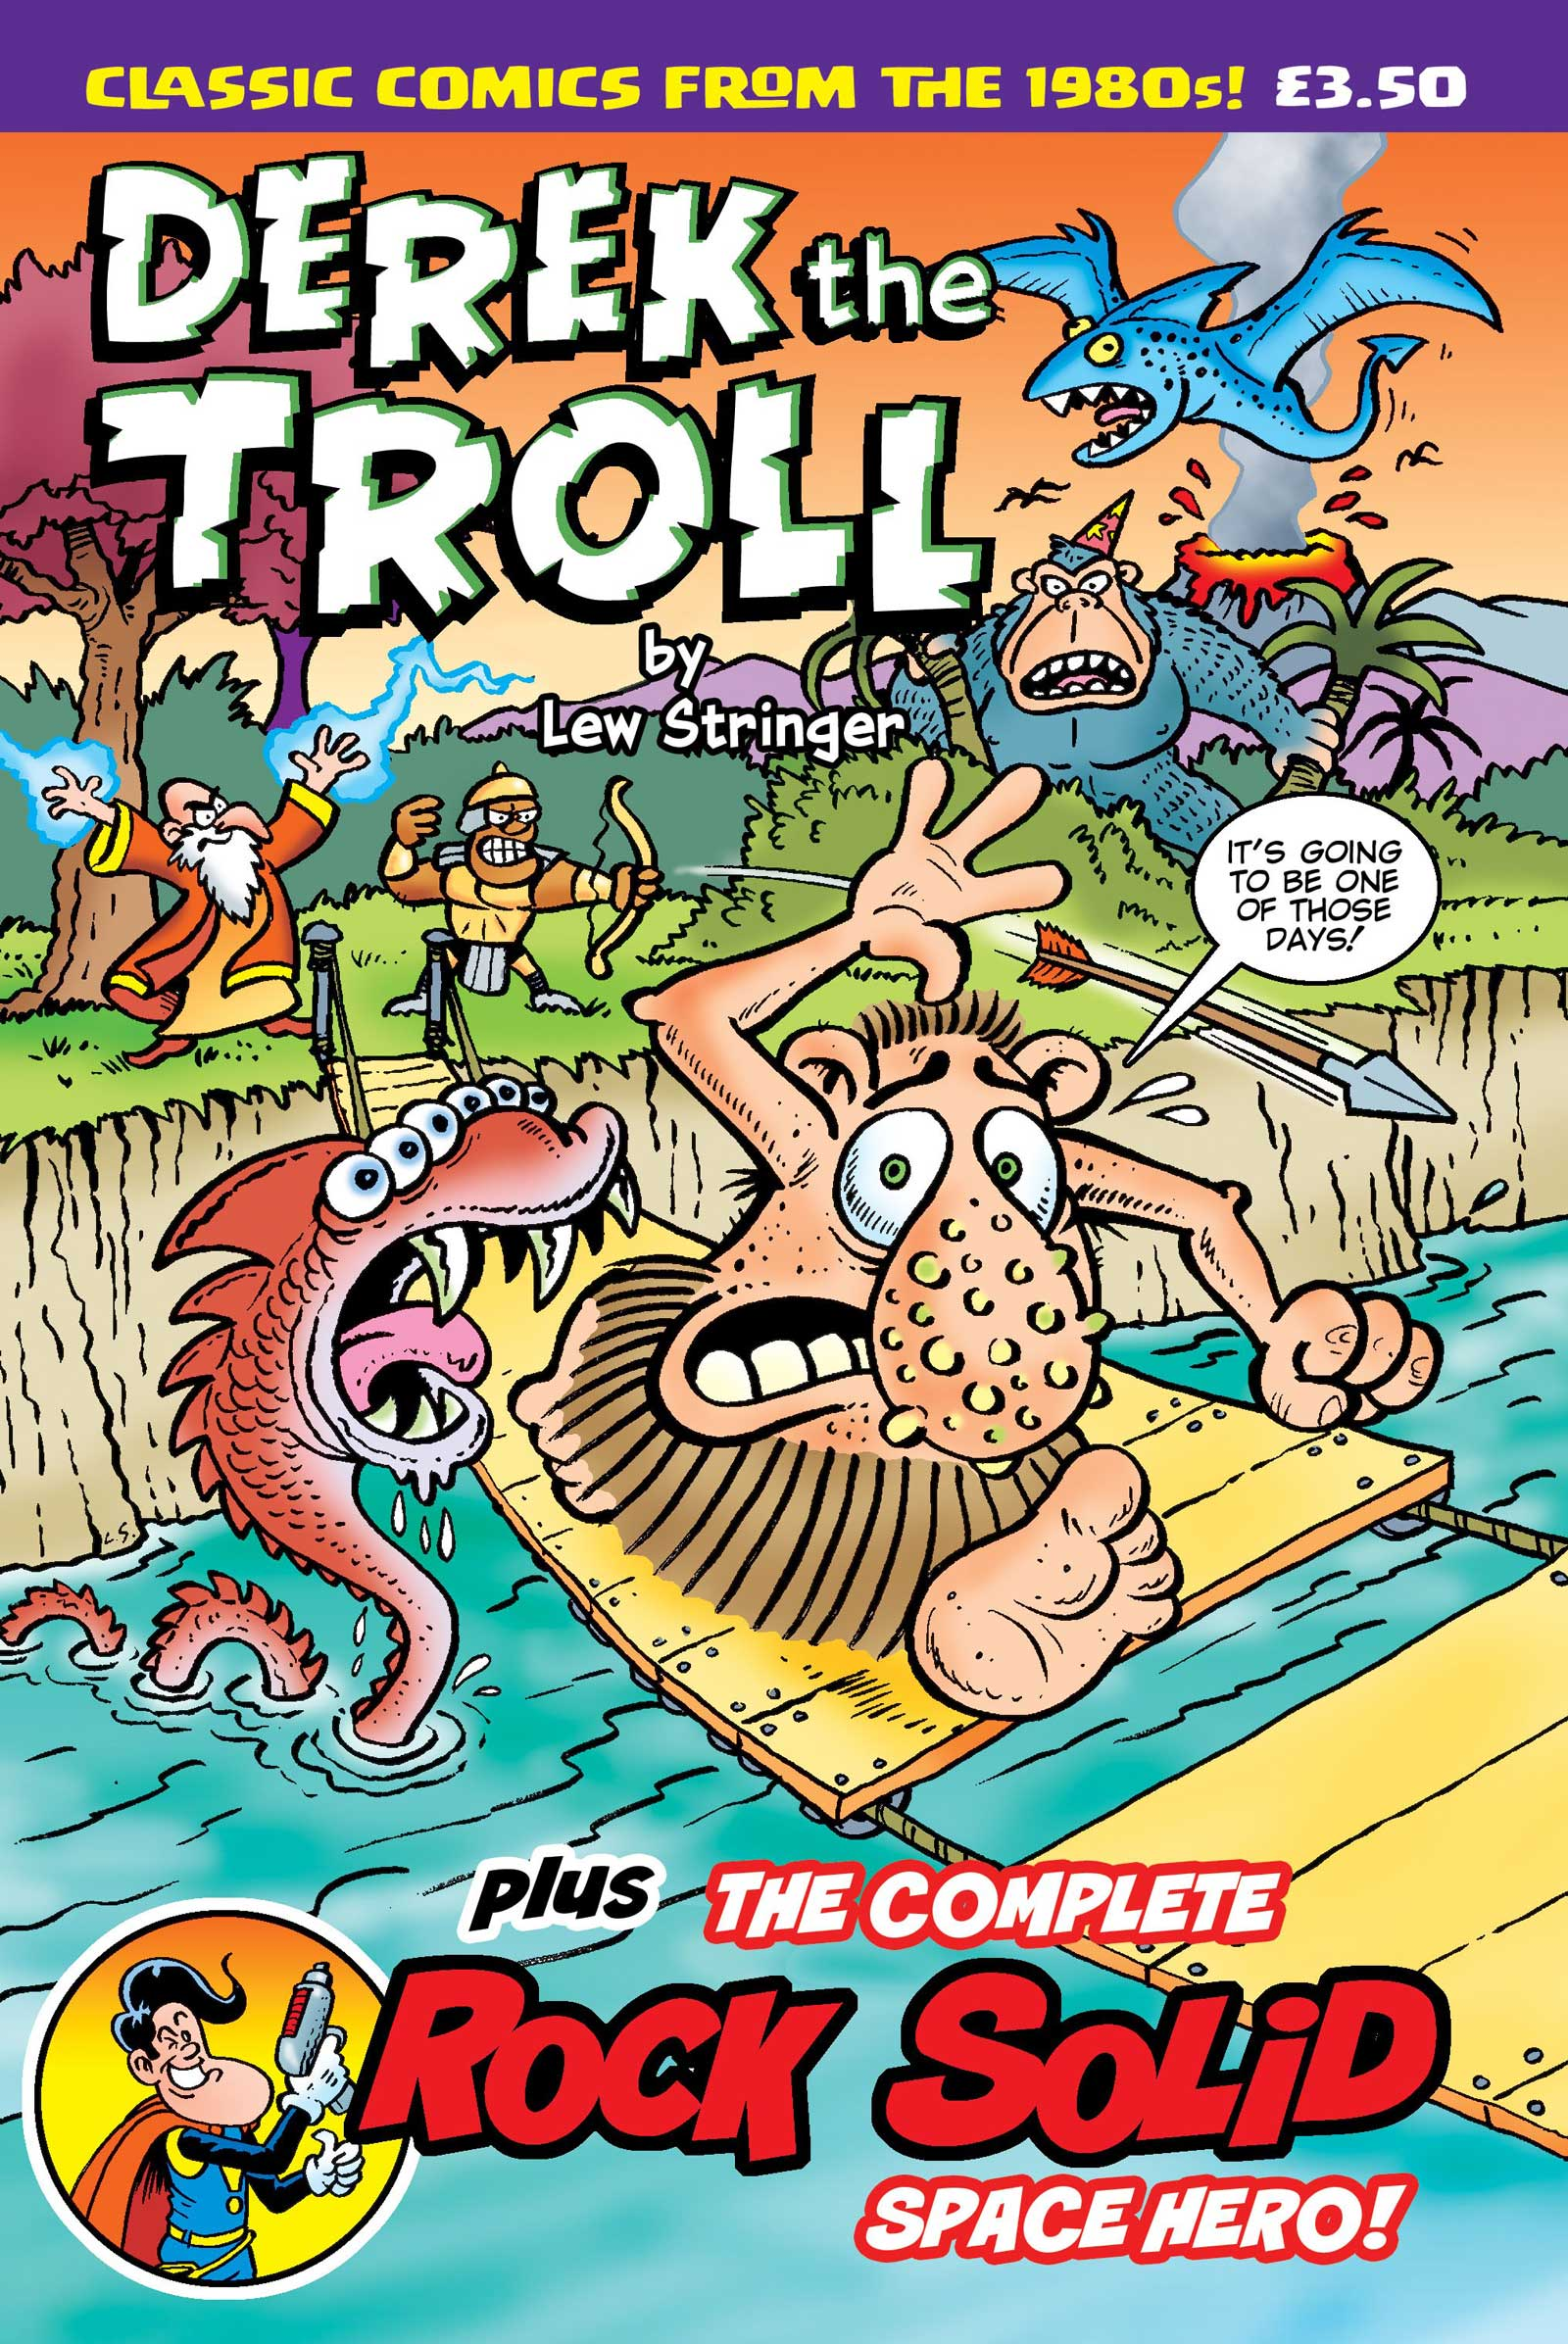 Derek the Troll by Lew Stringer